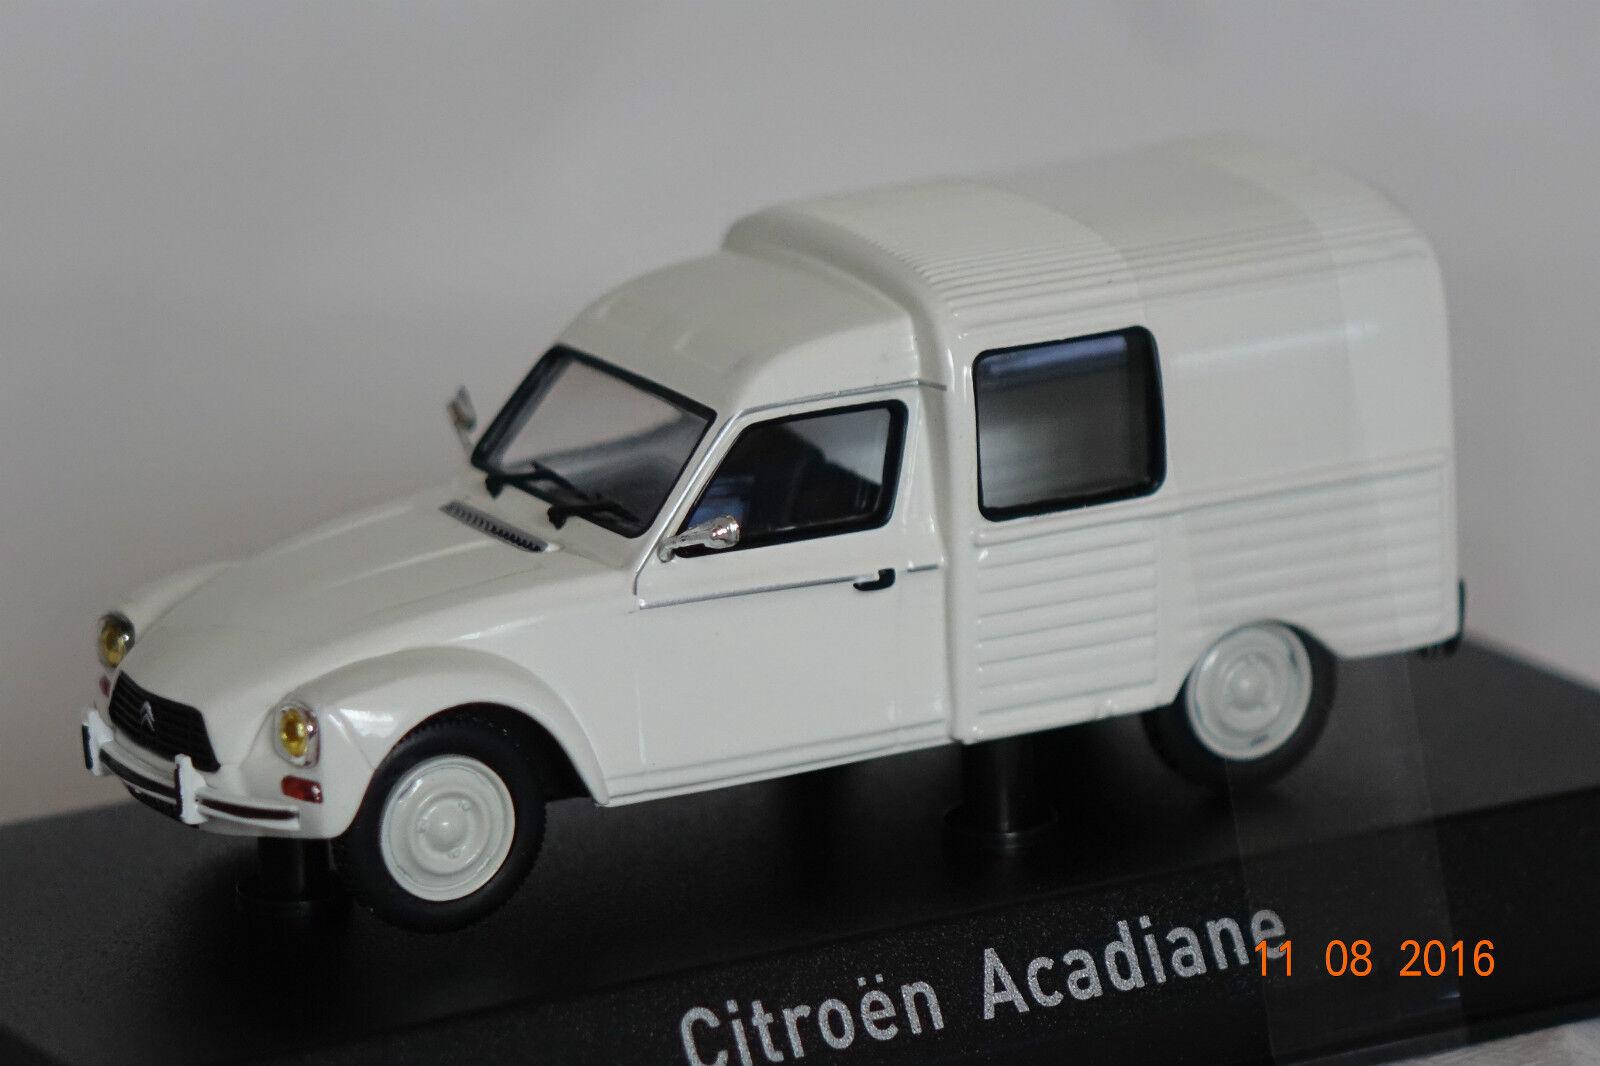 Citroen acadiane 1979 wei ß 1 43 norev neu + ovp 153766